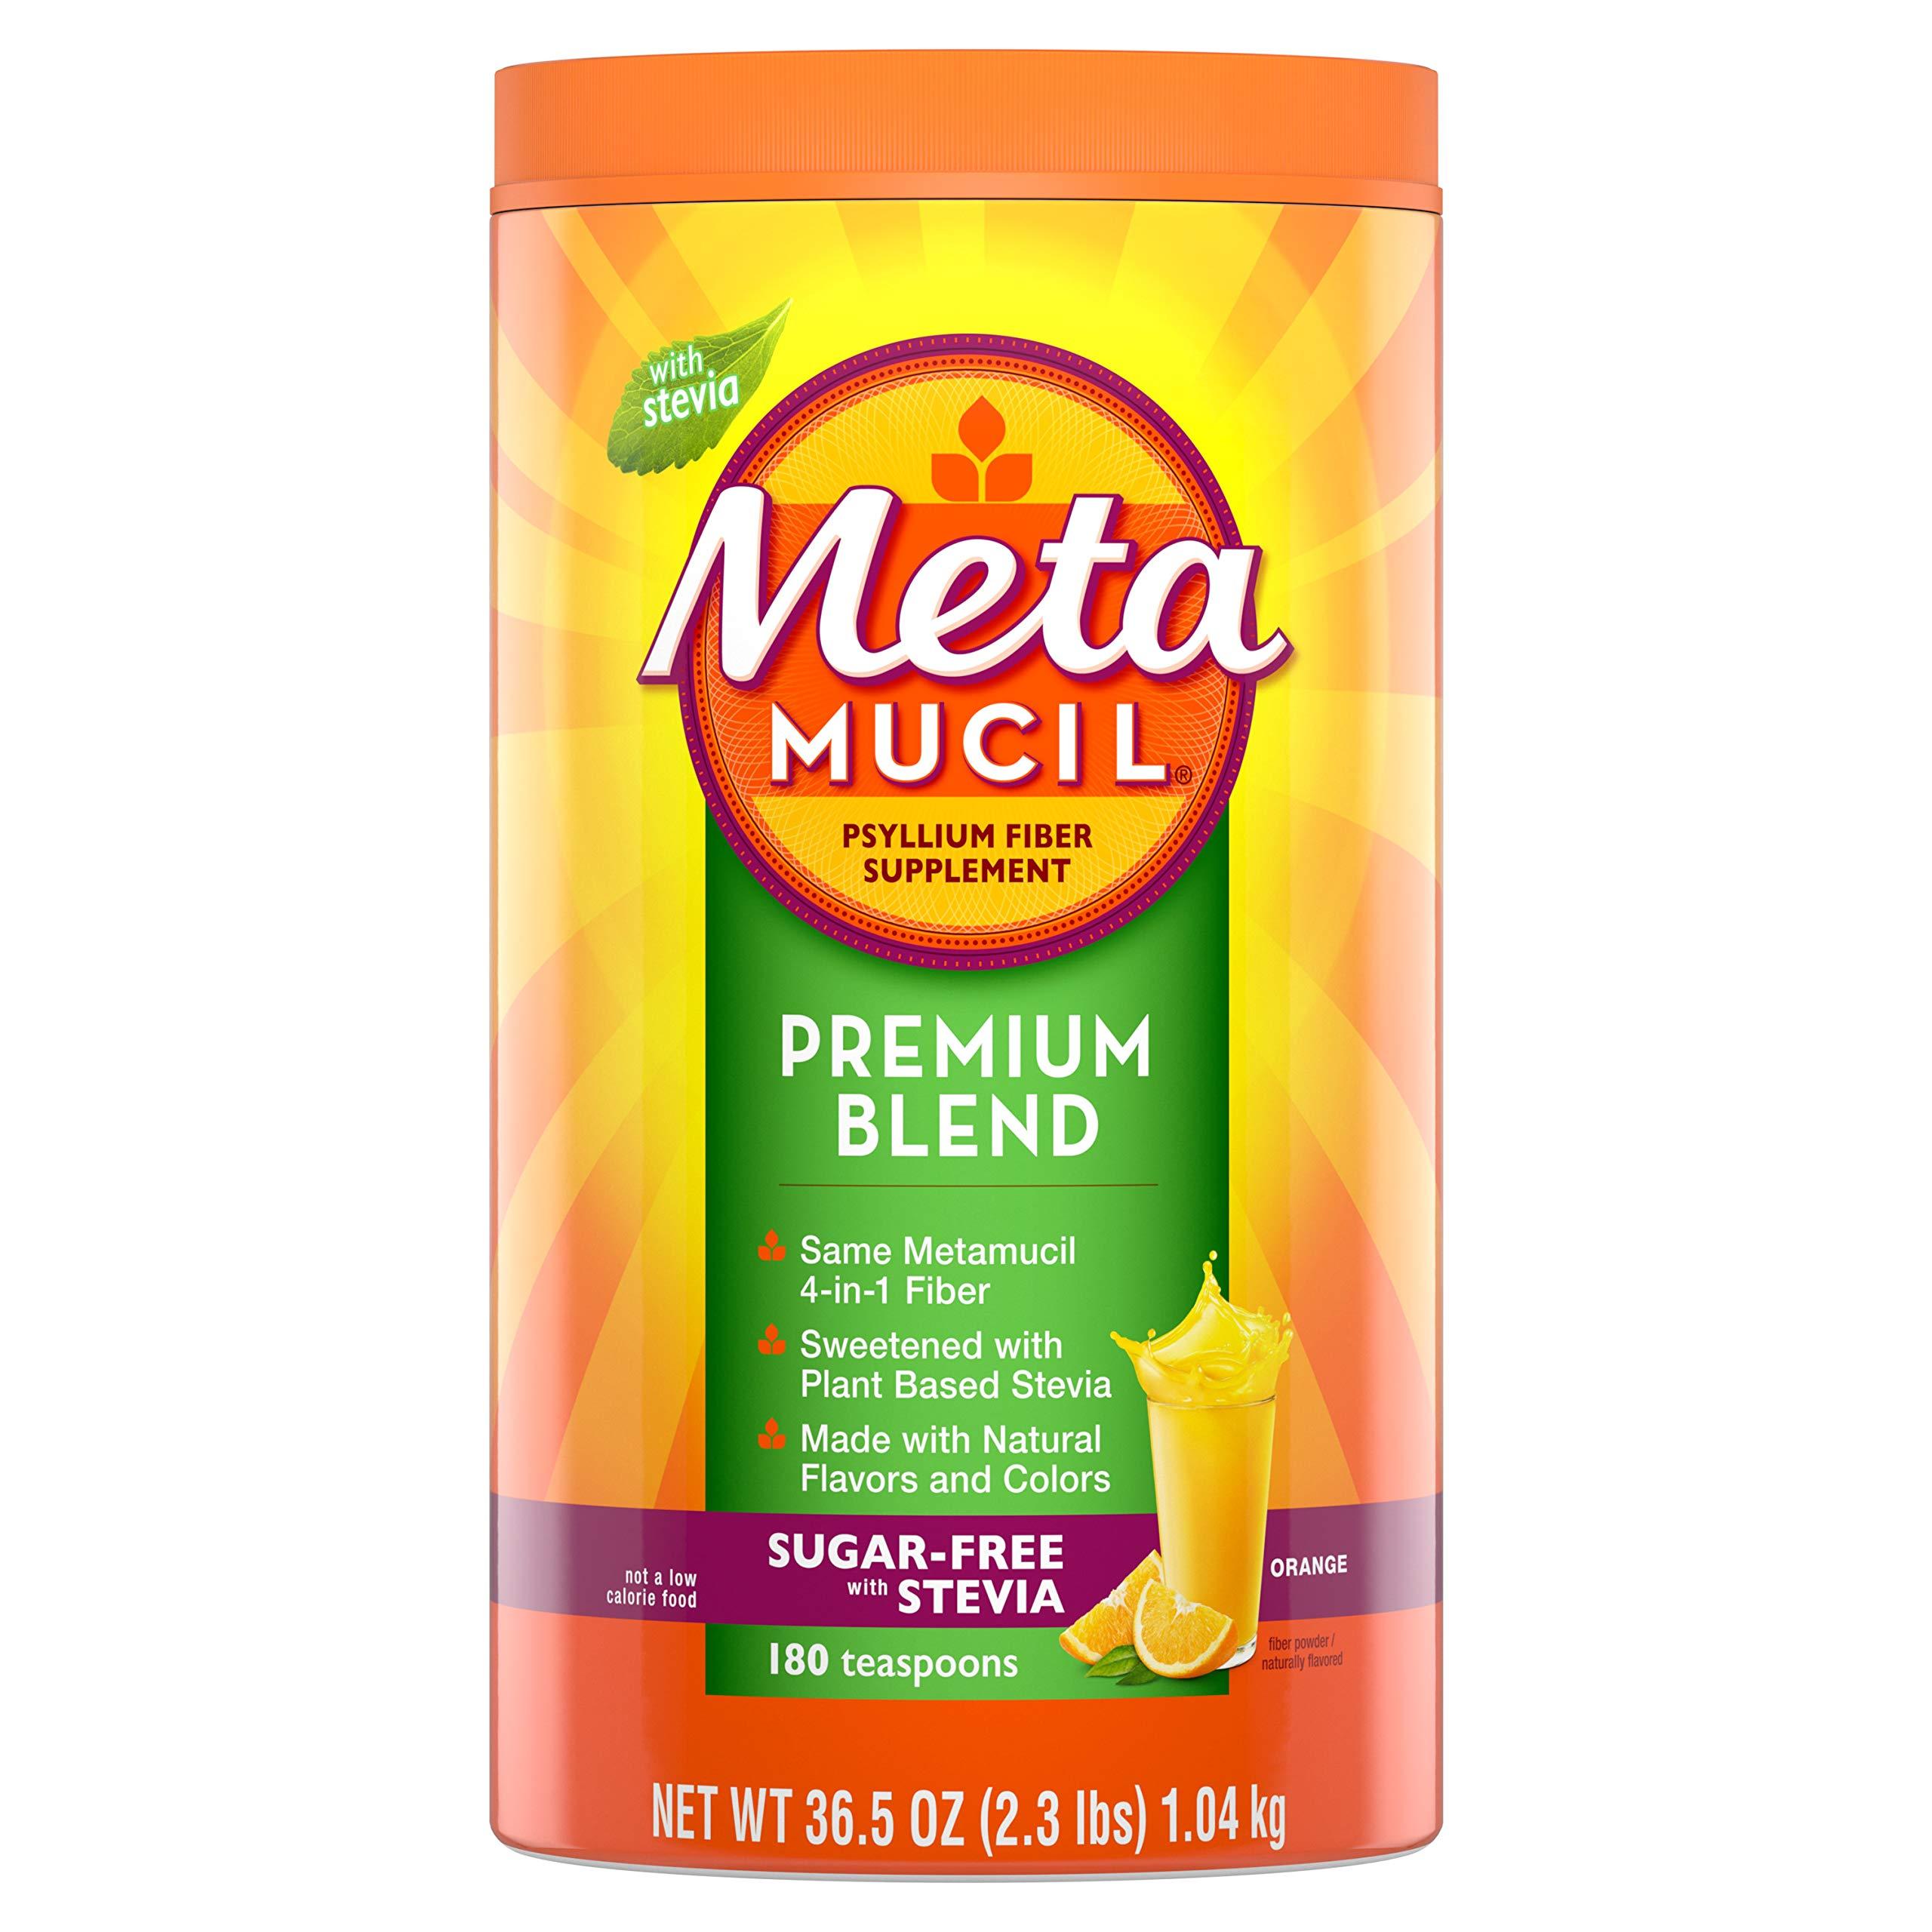 Metamucil Premium Blend, Psyllium Fiber Powder Supplement, Sugar-Free with Stevia, Natural Orange Flavor, 180 Servings, 36.5 Ounce